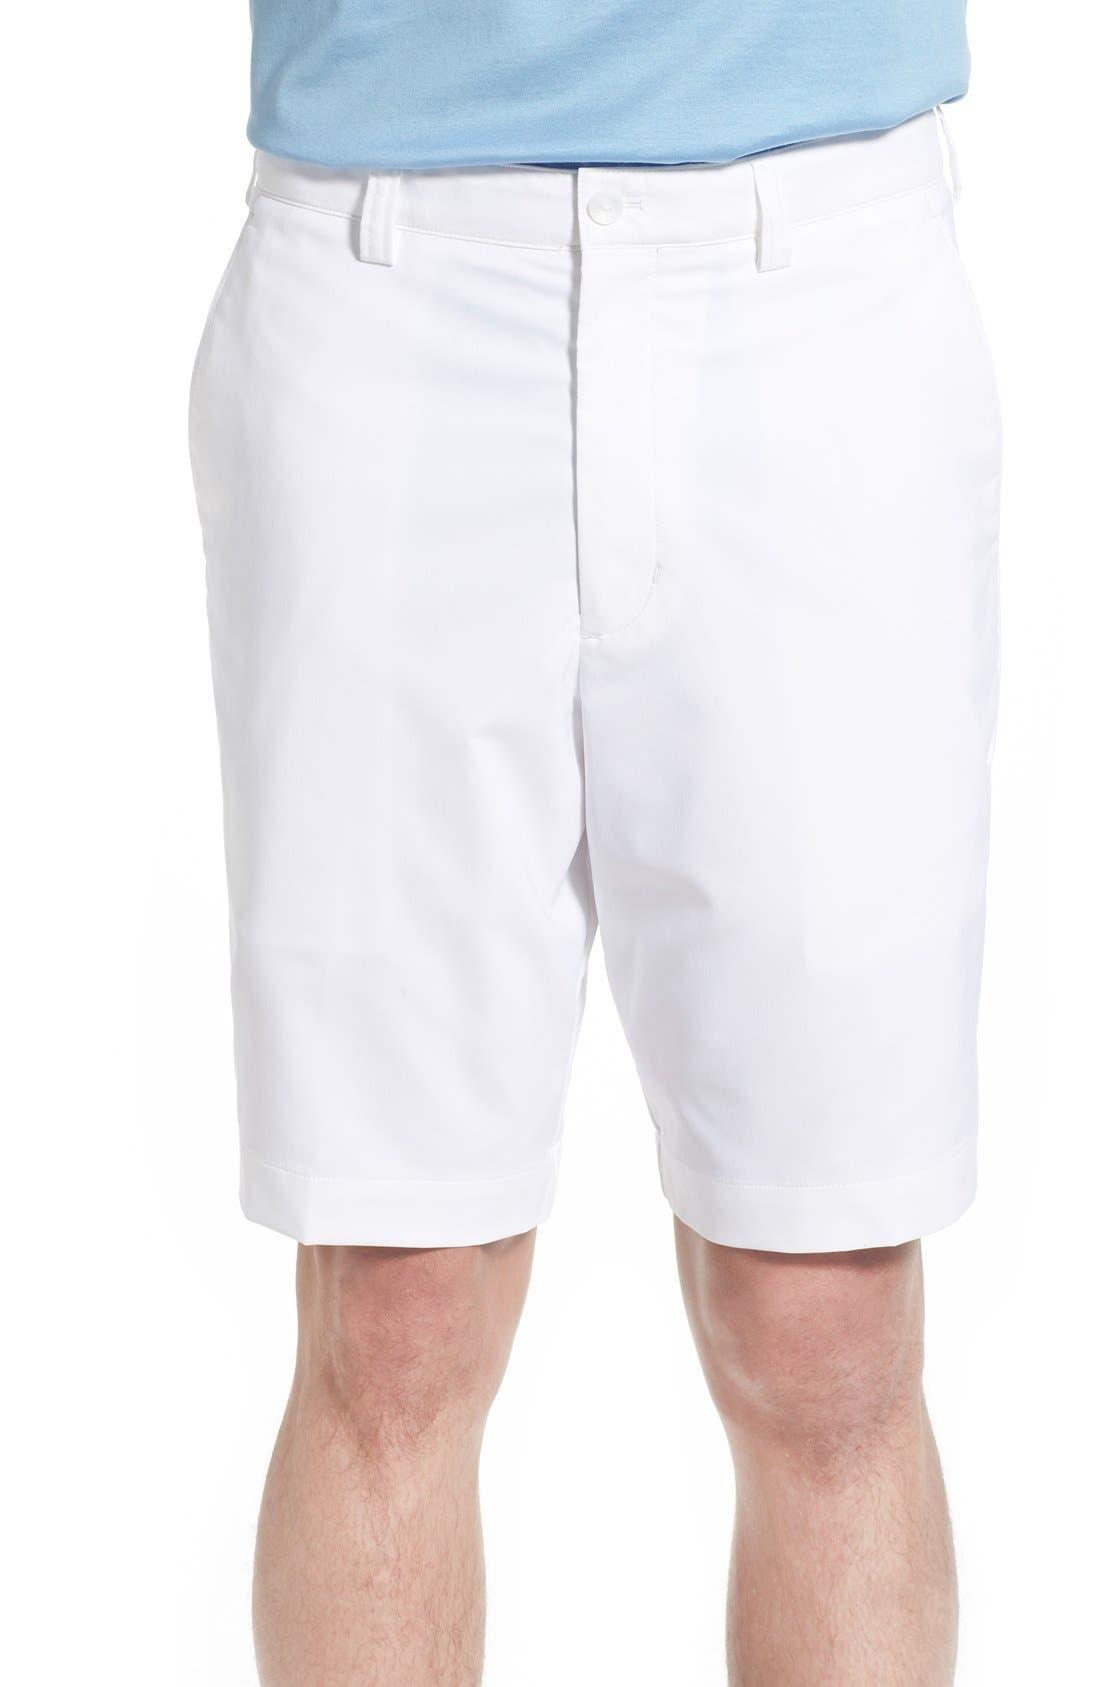 DryTec Shorts,                             Main thumbnail 1, color,                             WHITE